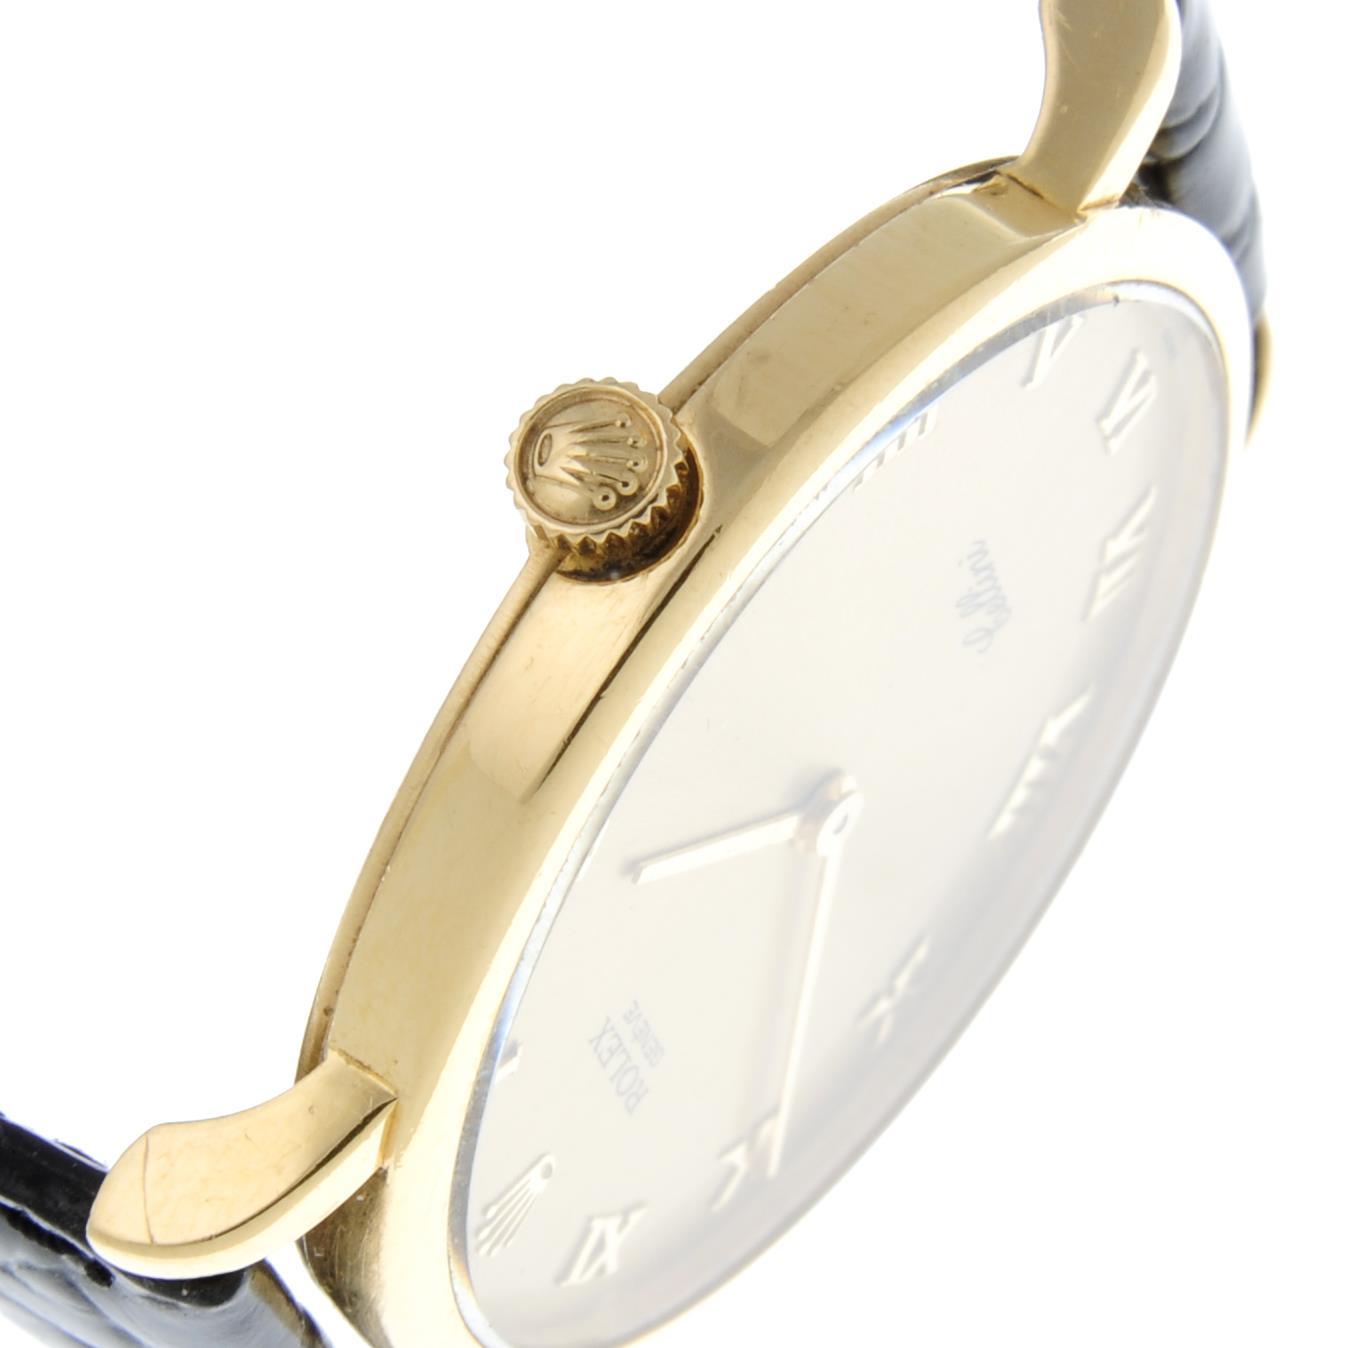 ROLEX - a Cellini wrist watch. - Image 4 of 5